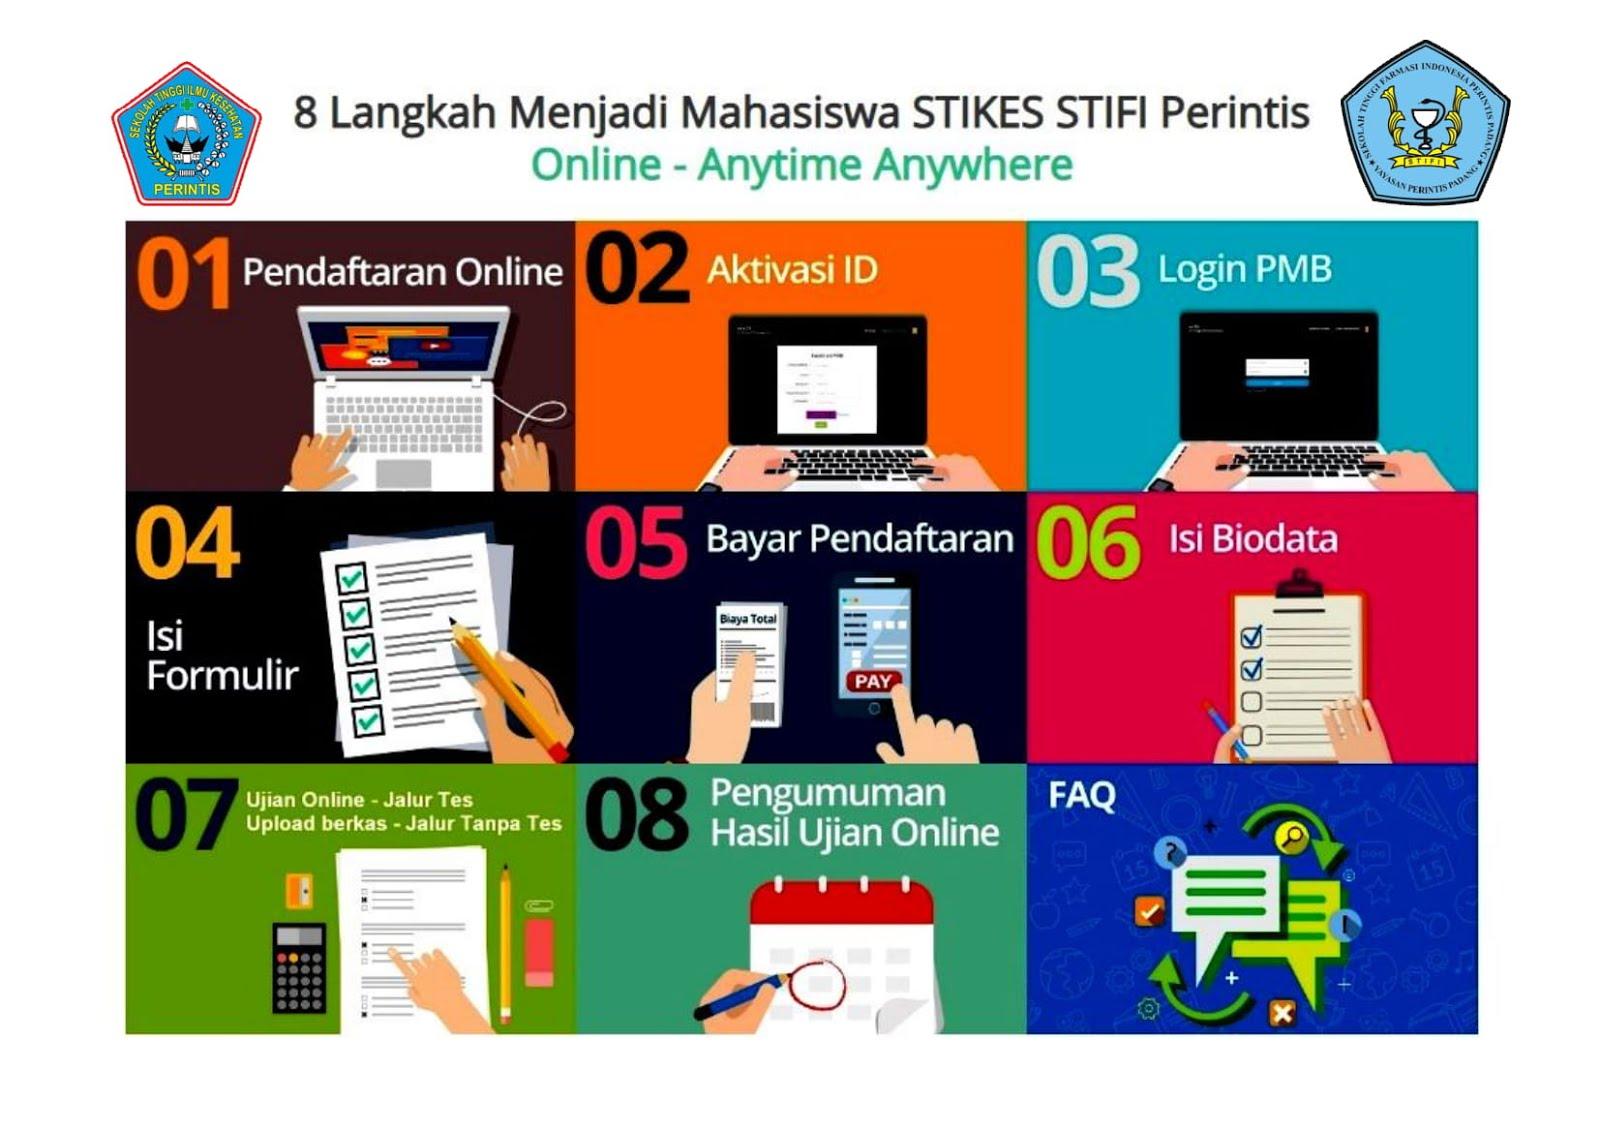 PMB ONLINE STIKES & STIFI PERINTIS PADANG